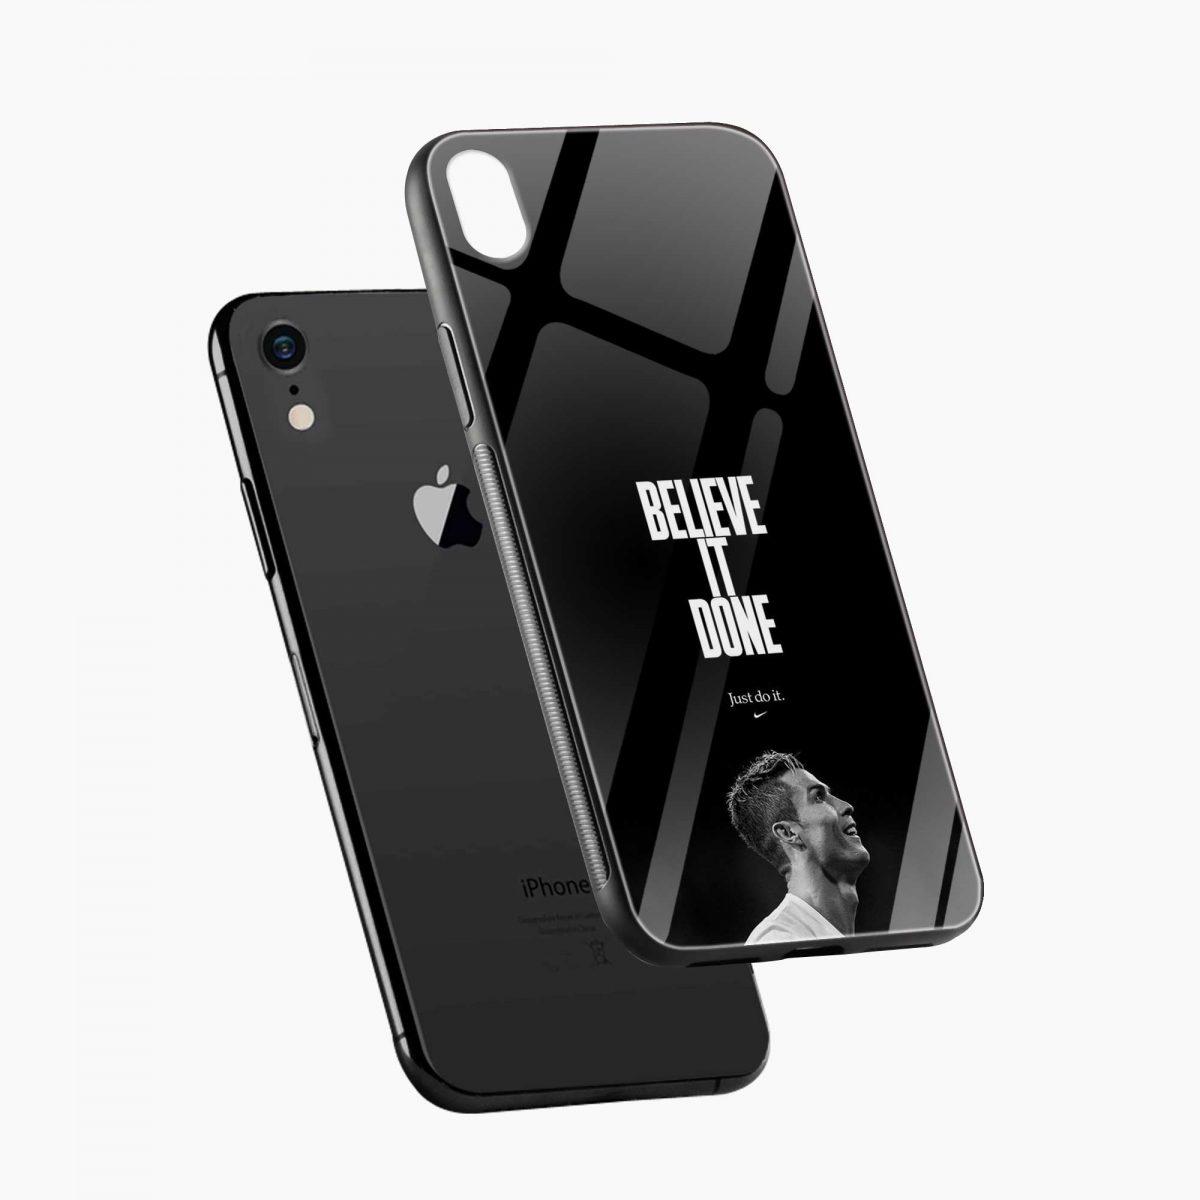 christiano ronaldo black white apple iphone xr back cover diagonal view